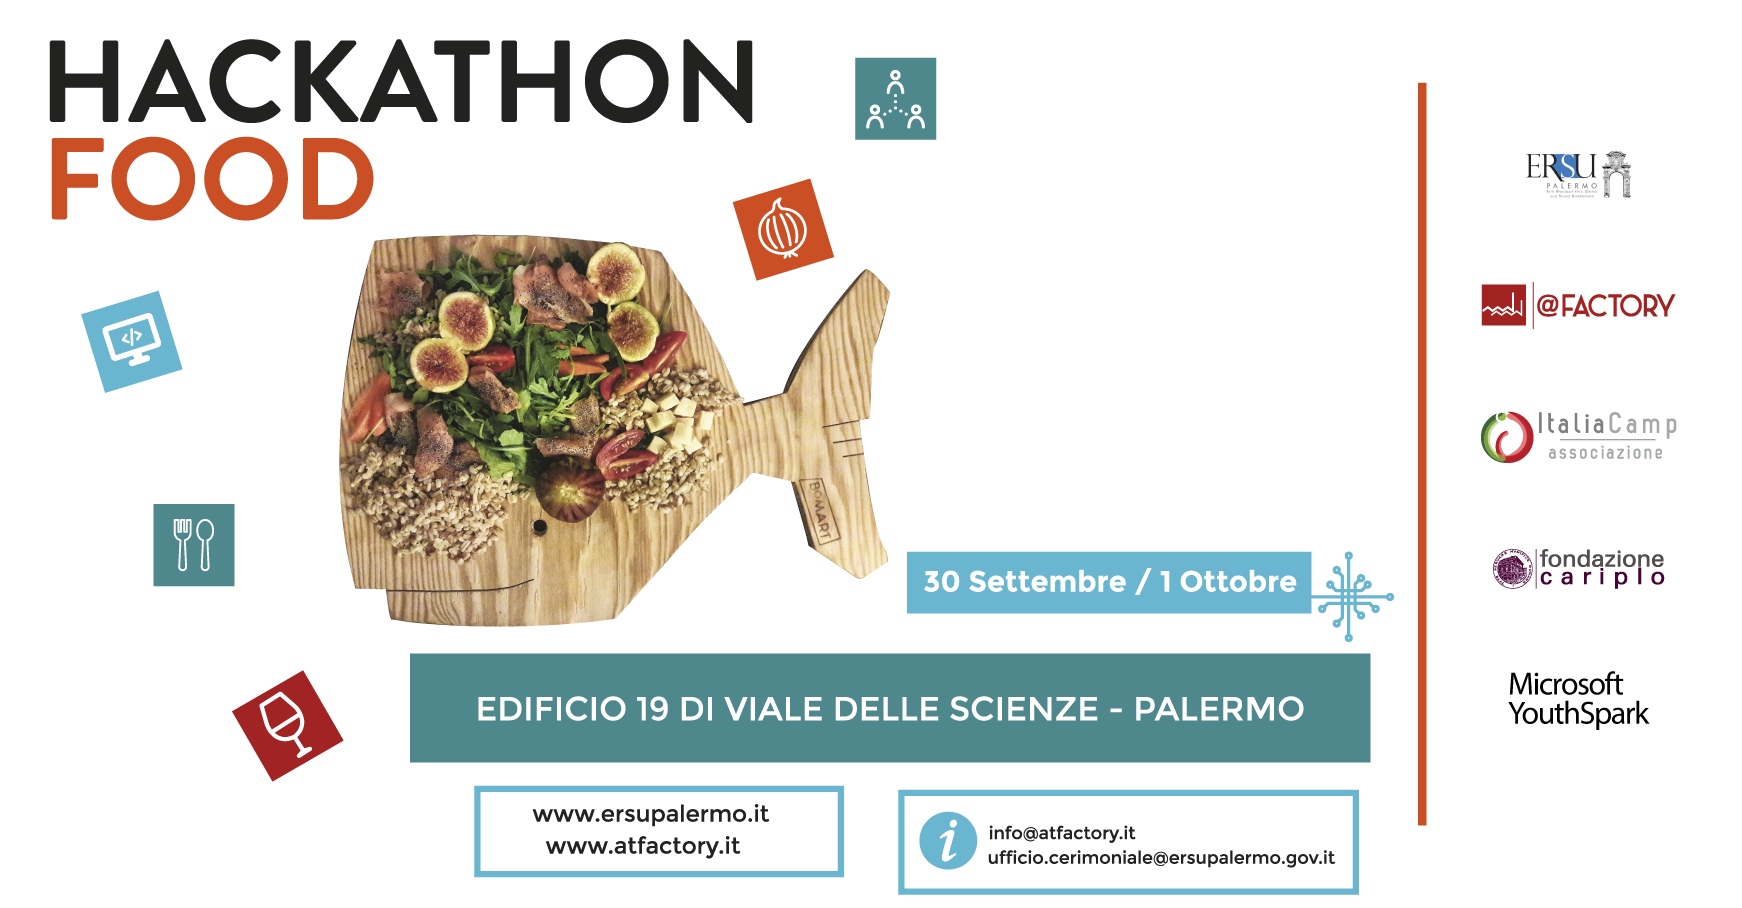 Hackathon Food